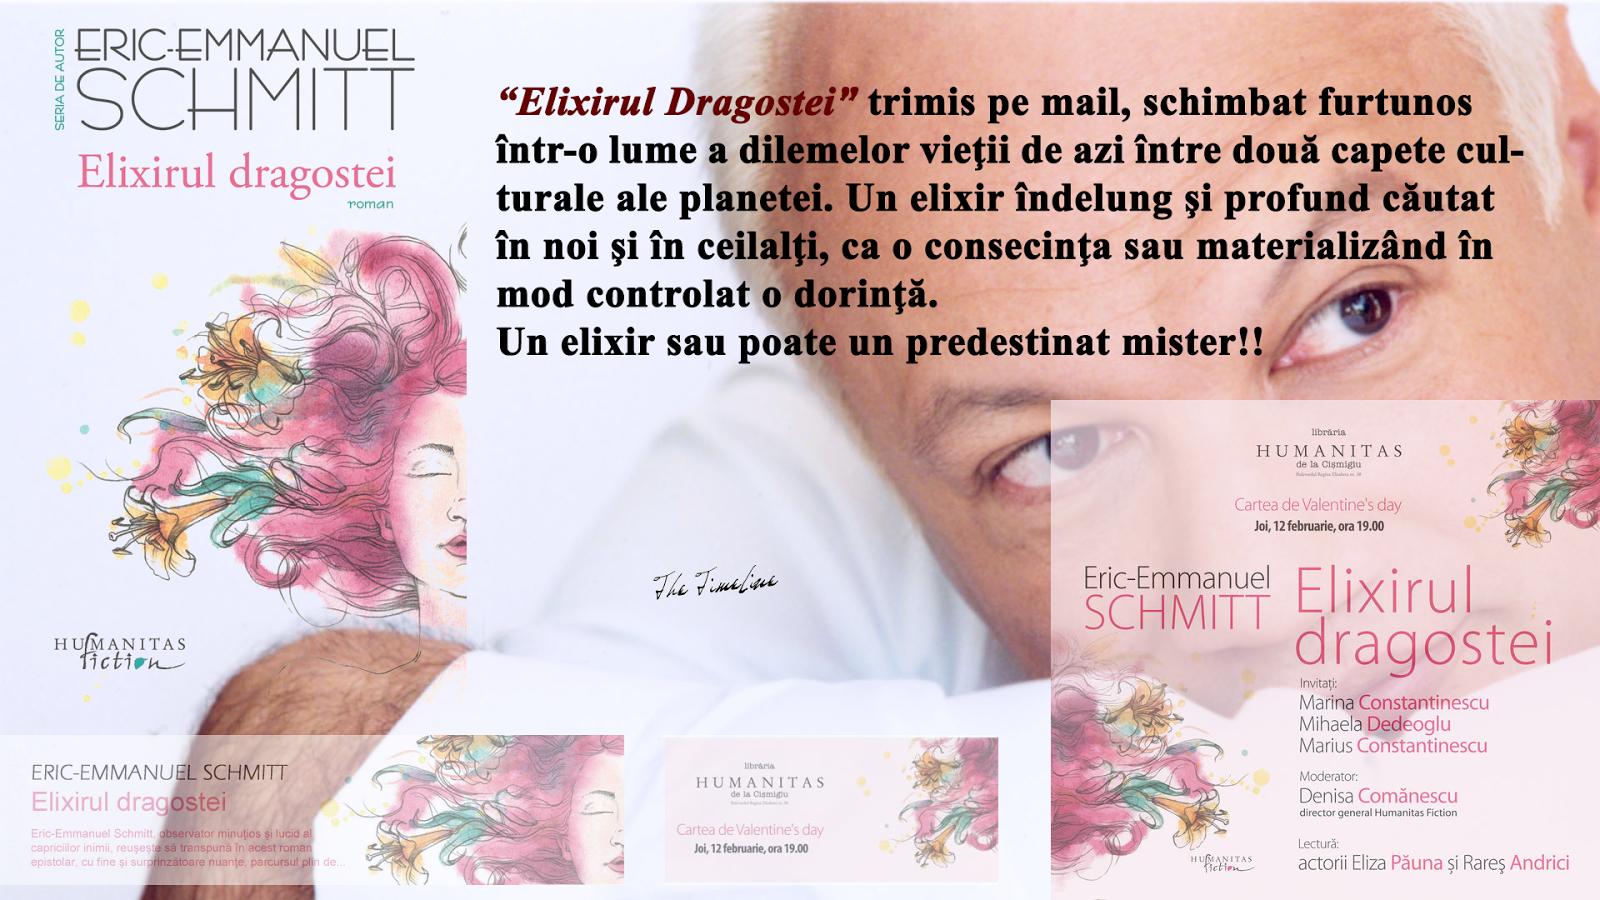 Elixirul Dragostei - Eric Emmanuel Schmitt recenzie Maria Teodorescu Bahnareanu Wrinkles on my Timeline